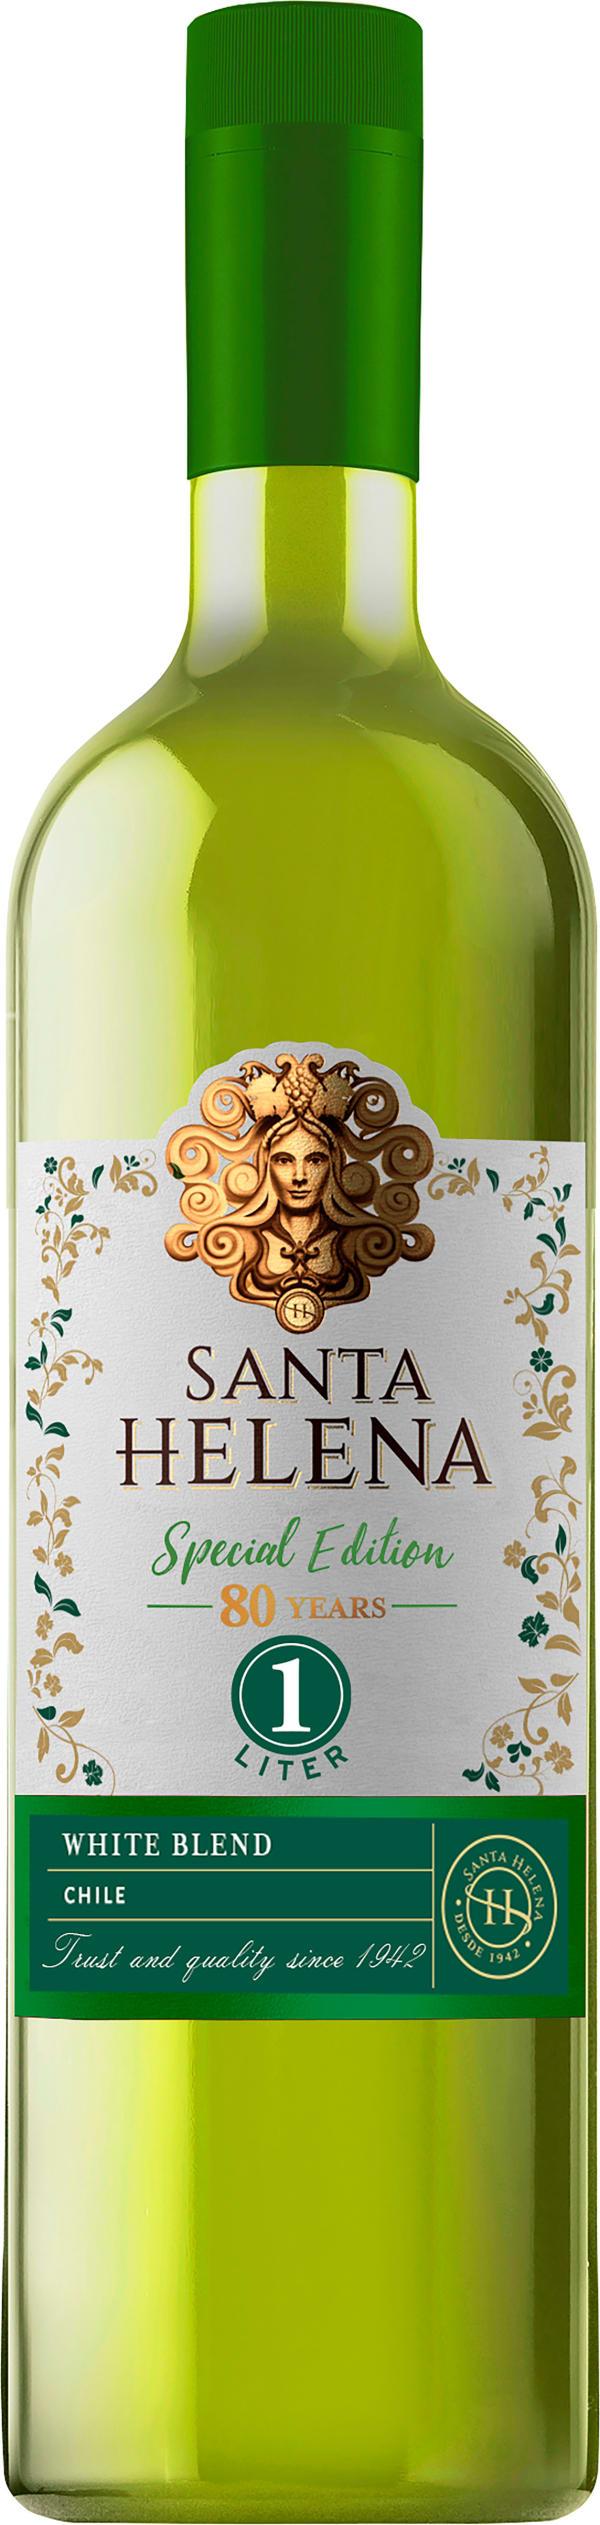 Santa Helena Varietal White Blend 2017 plastflaska